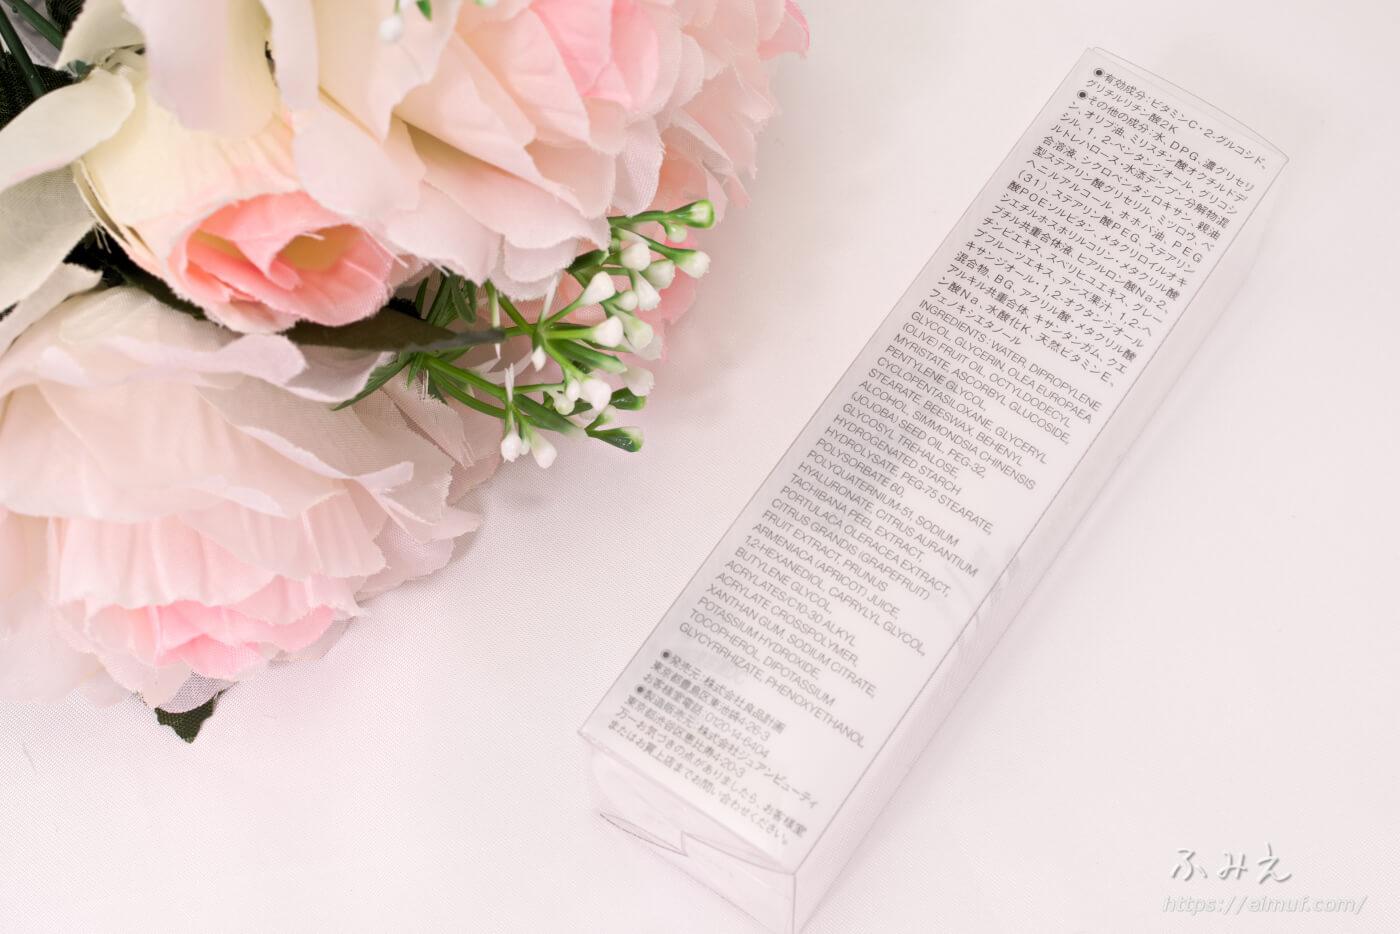 無印良品 敏感肌用 薬用美白美容液 パッケージ側面